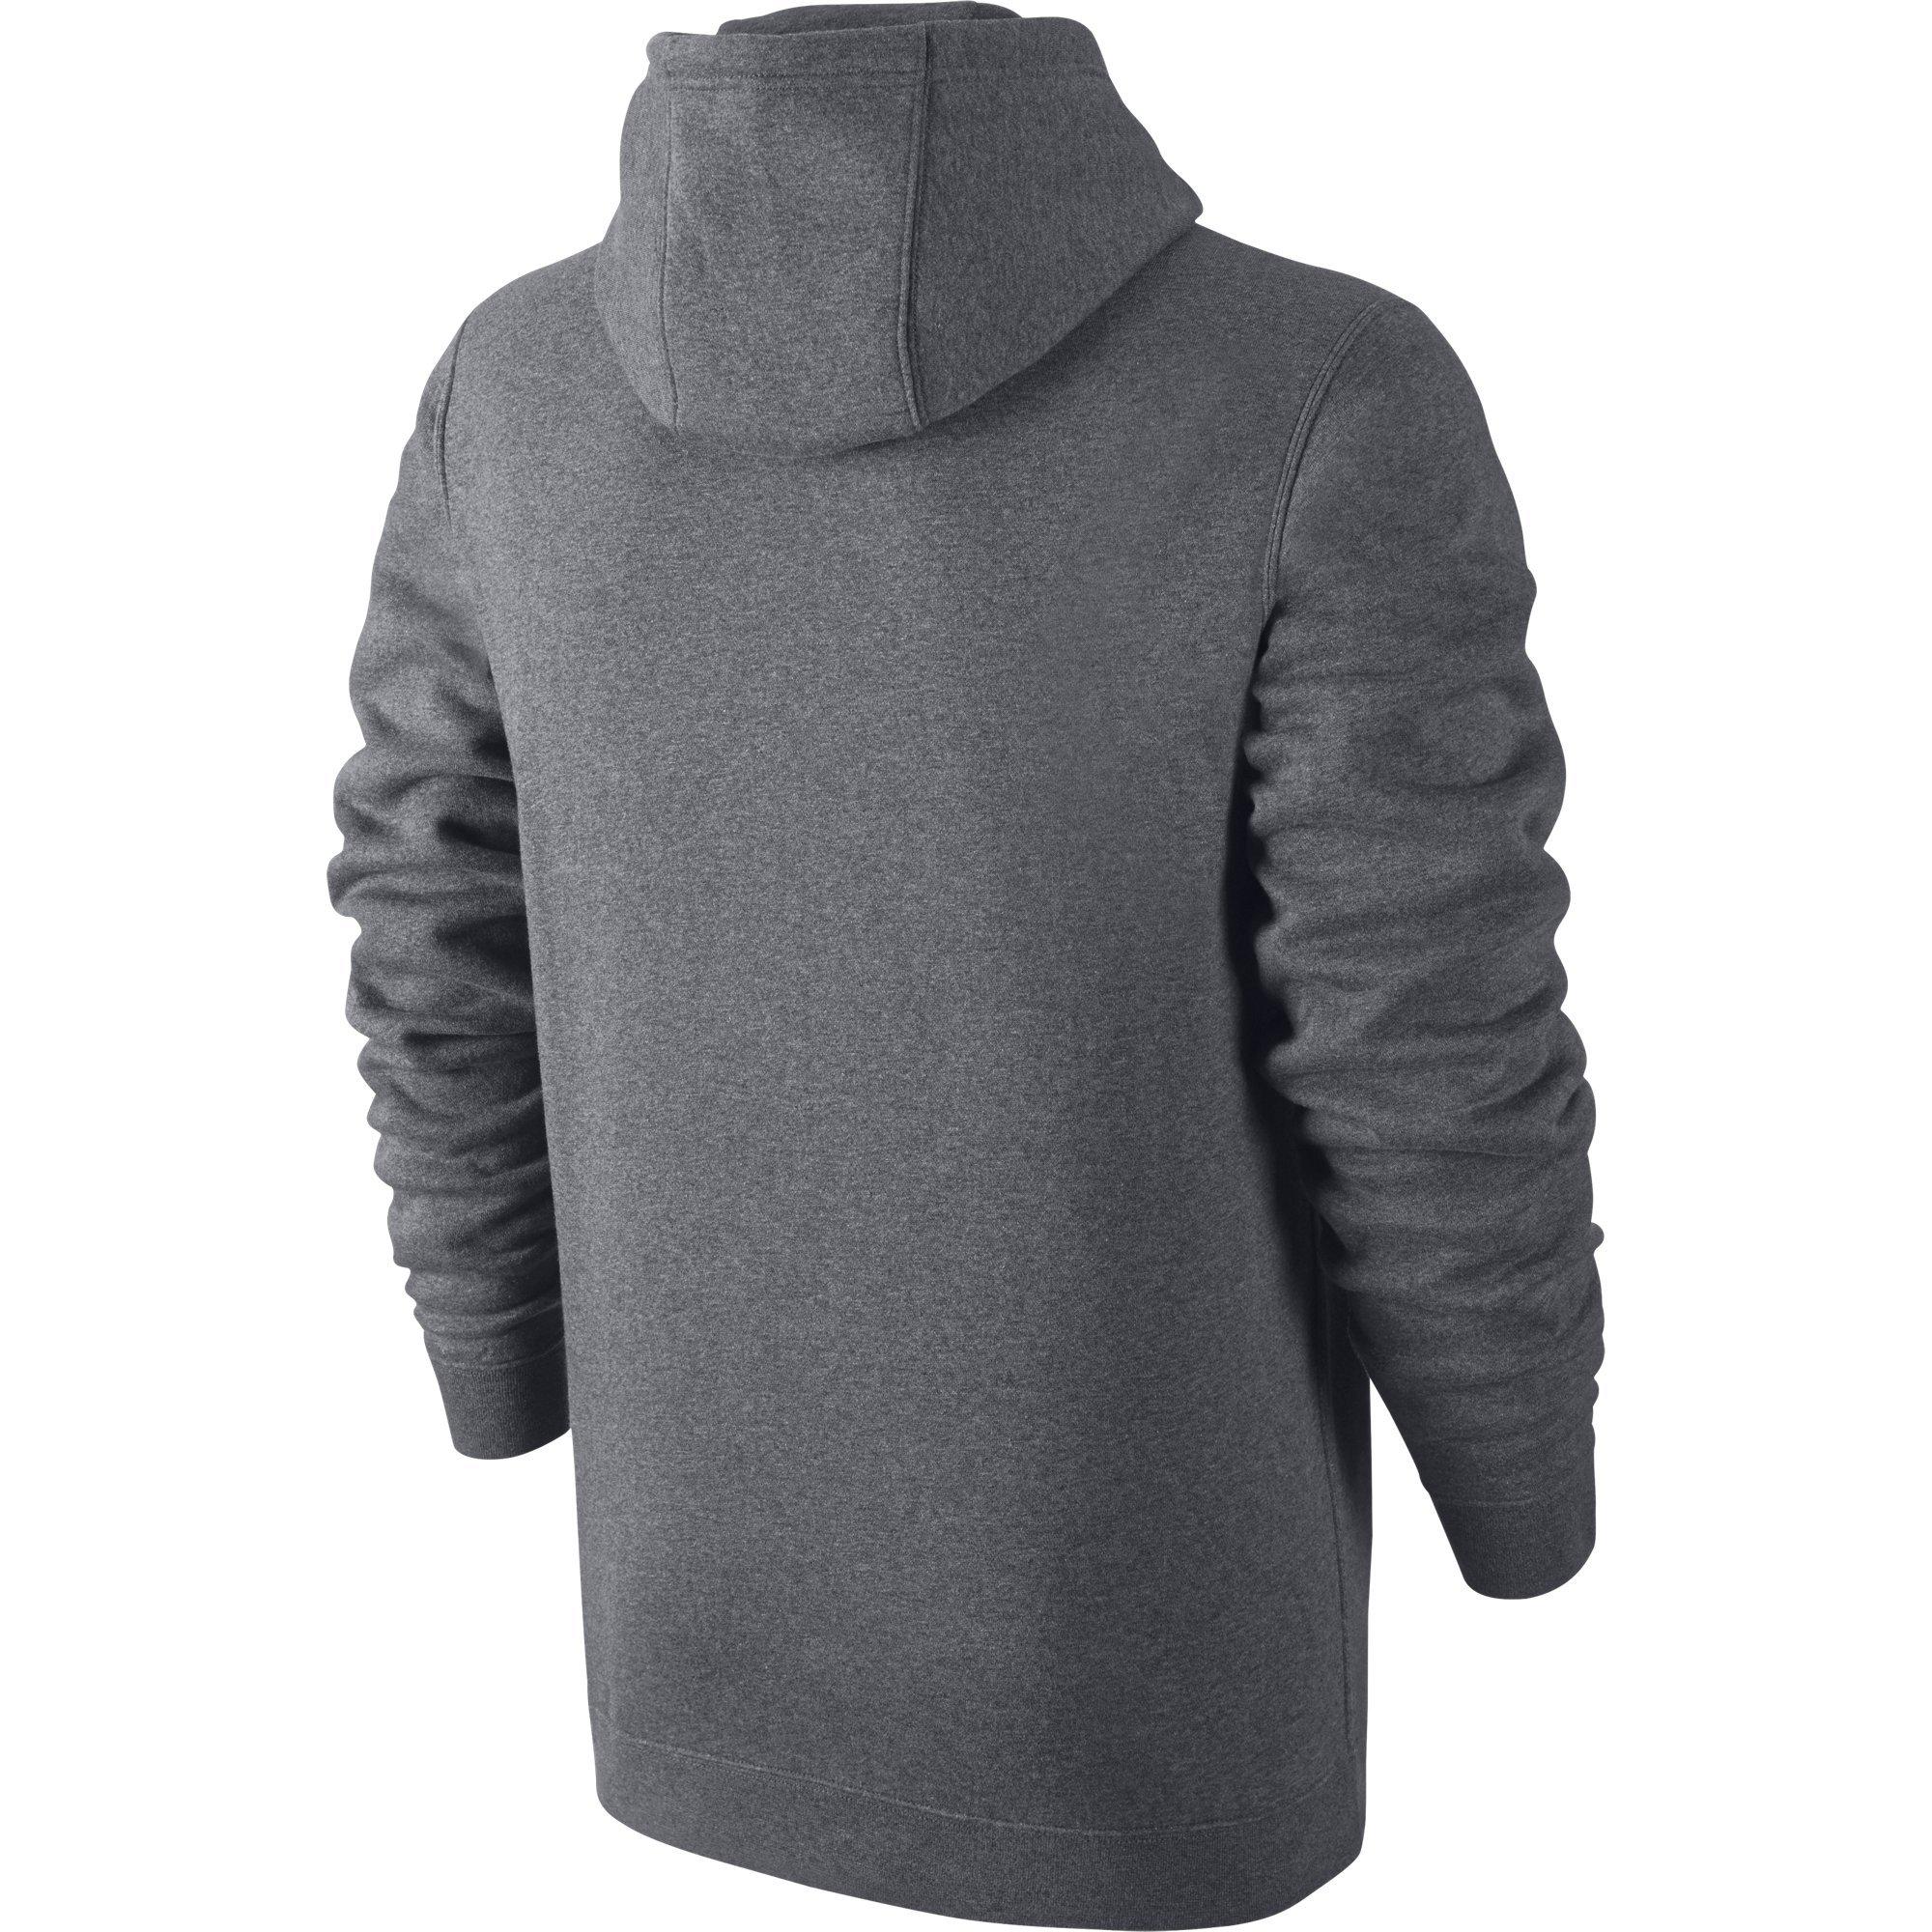 Men's Nike Sportswear Club Pullover Hoodie, Fleece Sweatshirt for Men with Paneled Hood, Charcoal Heather/Charcoal Heather/White, S by Nike (Image #2)